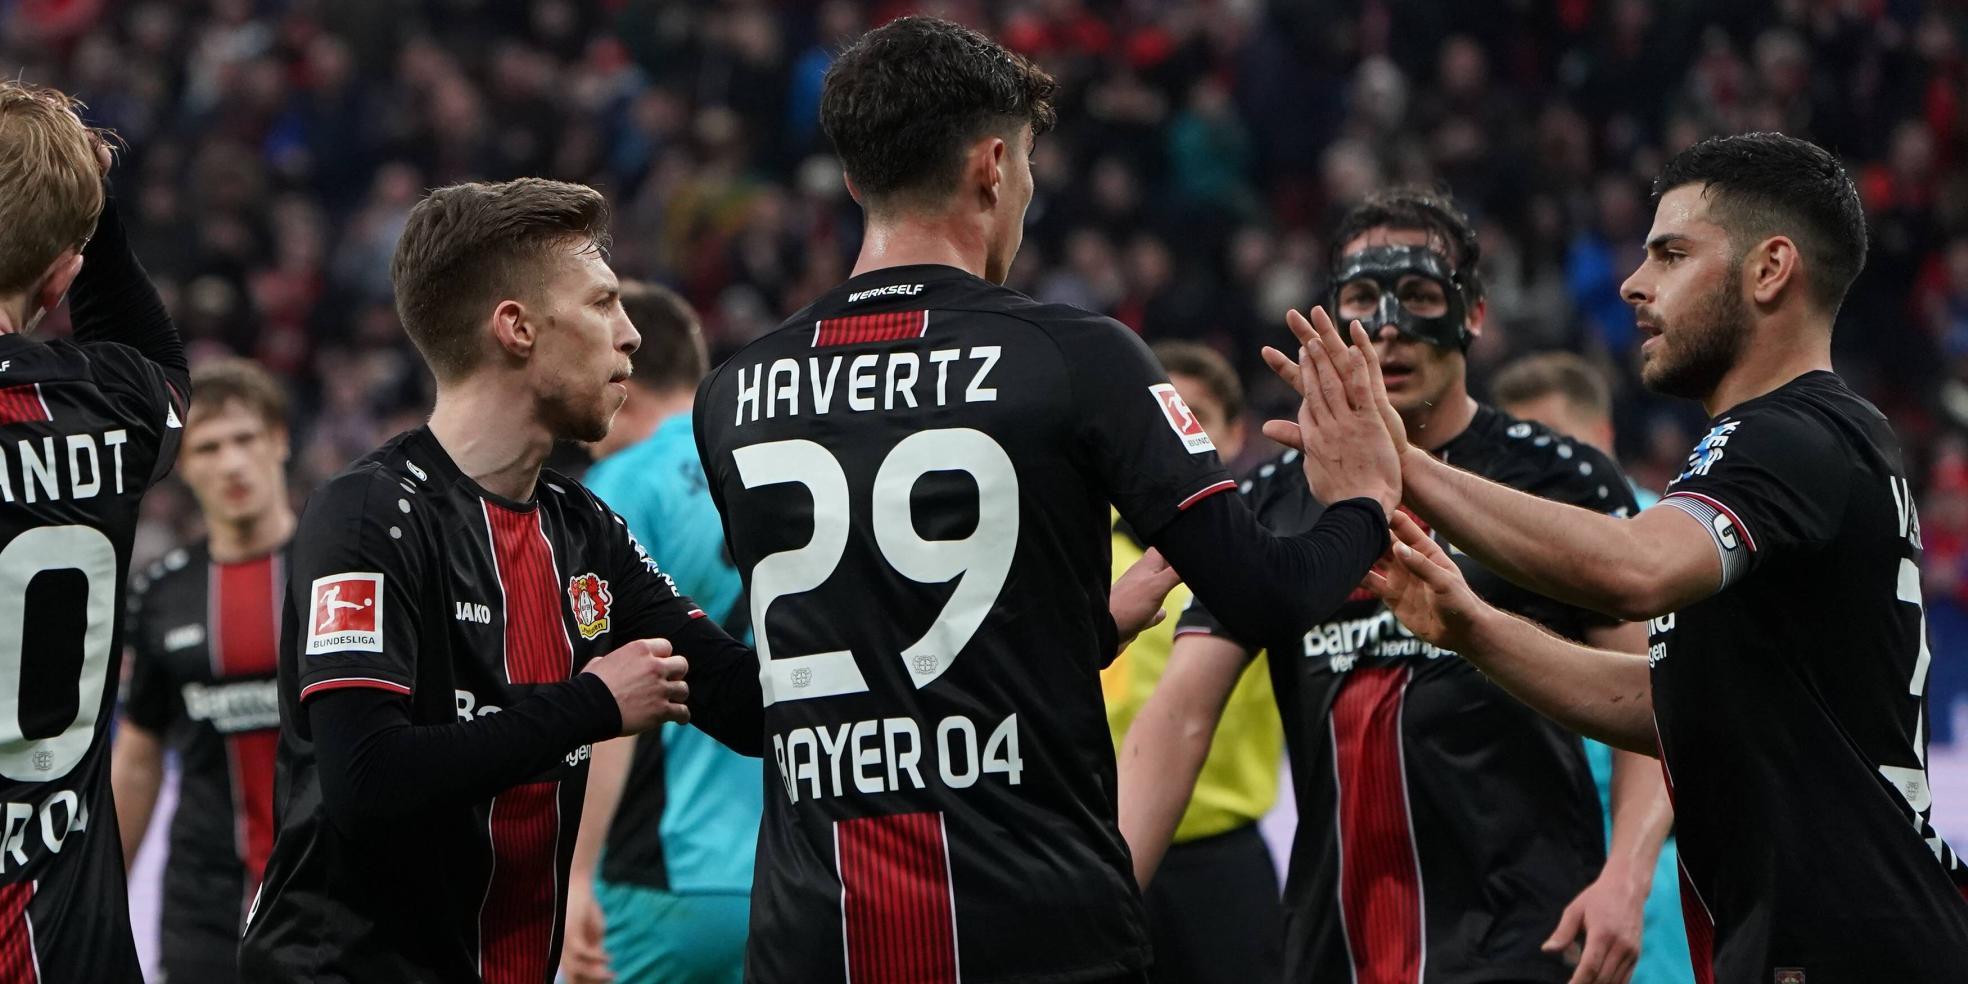 Bayer 04 Leverkusen - Havertz, Volland & Co.